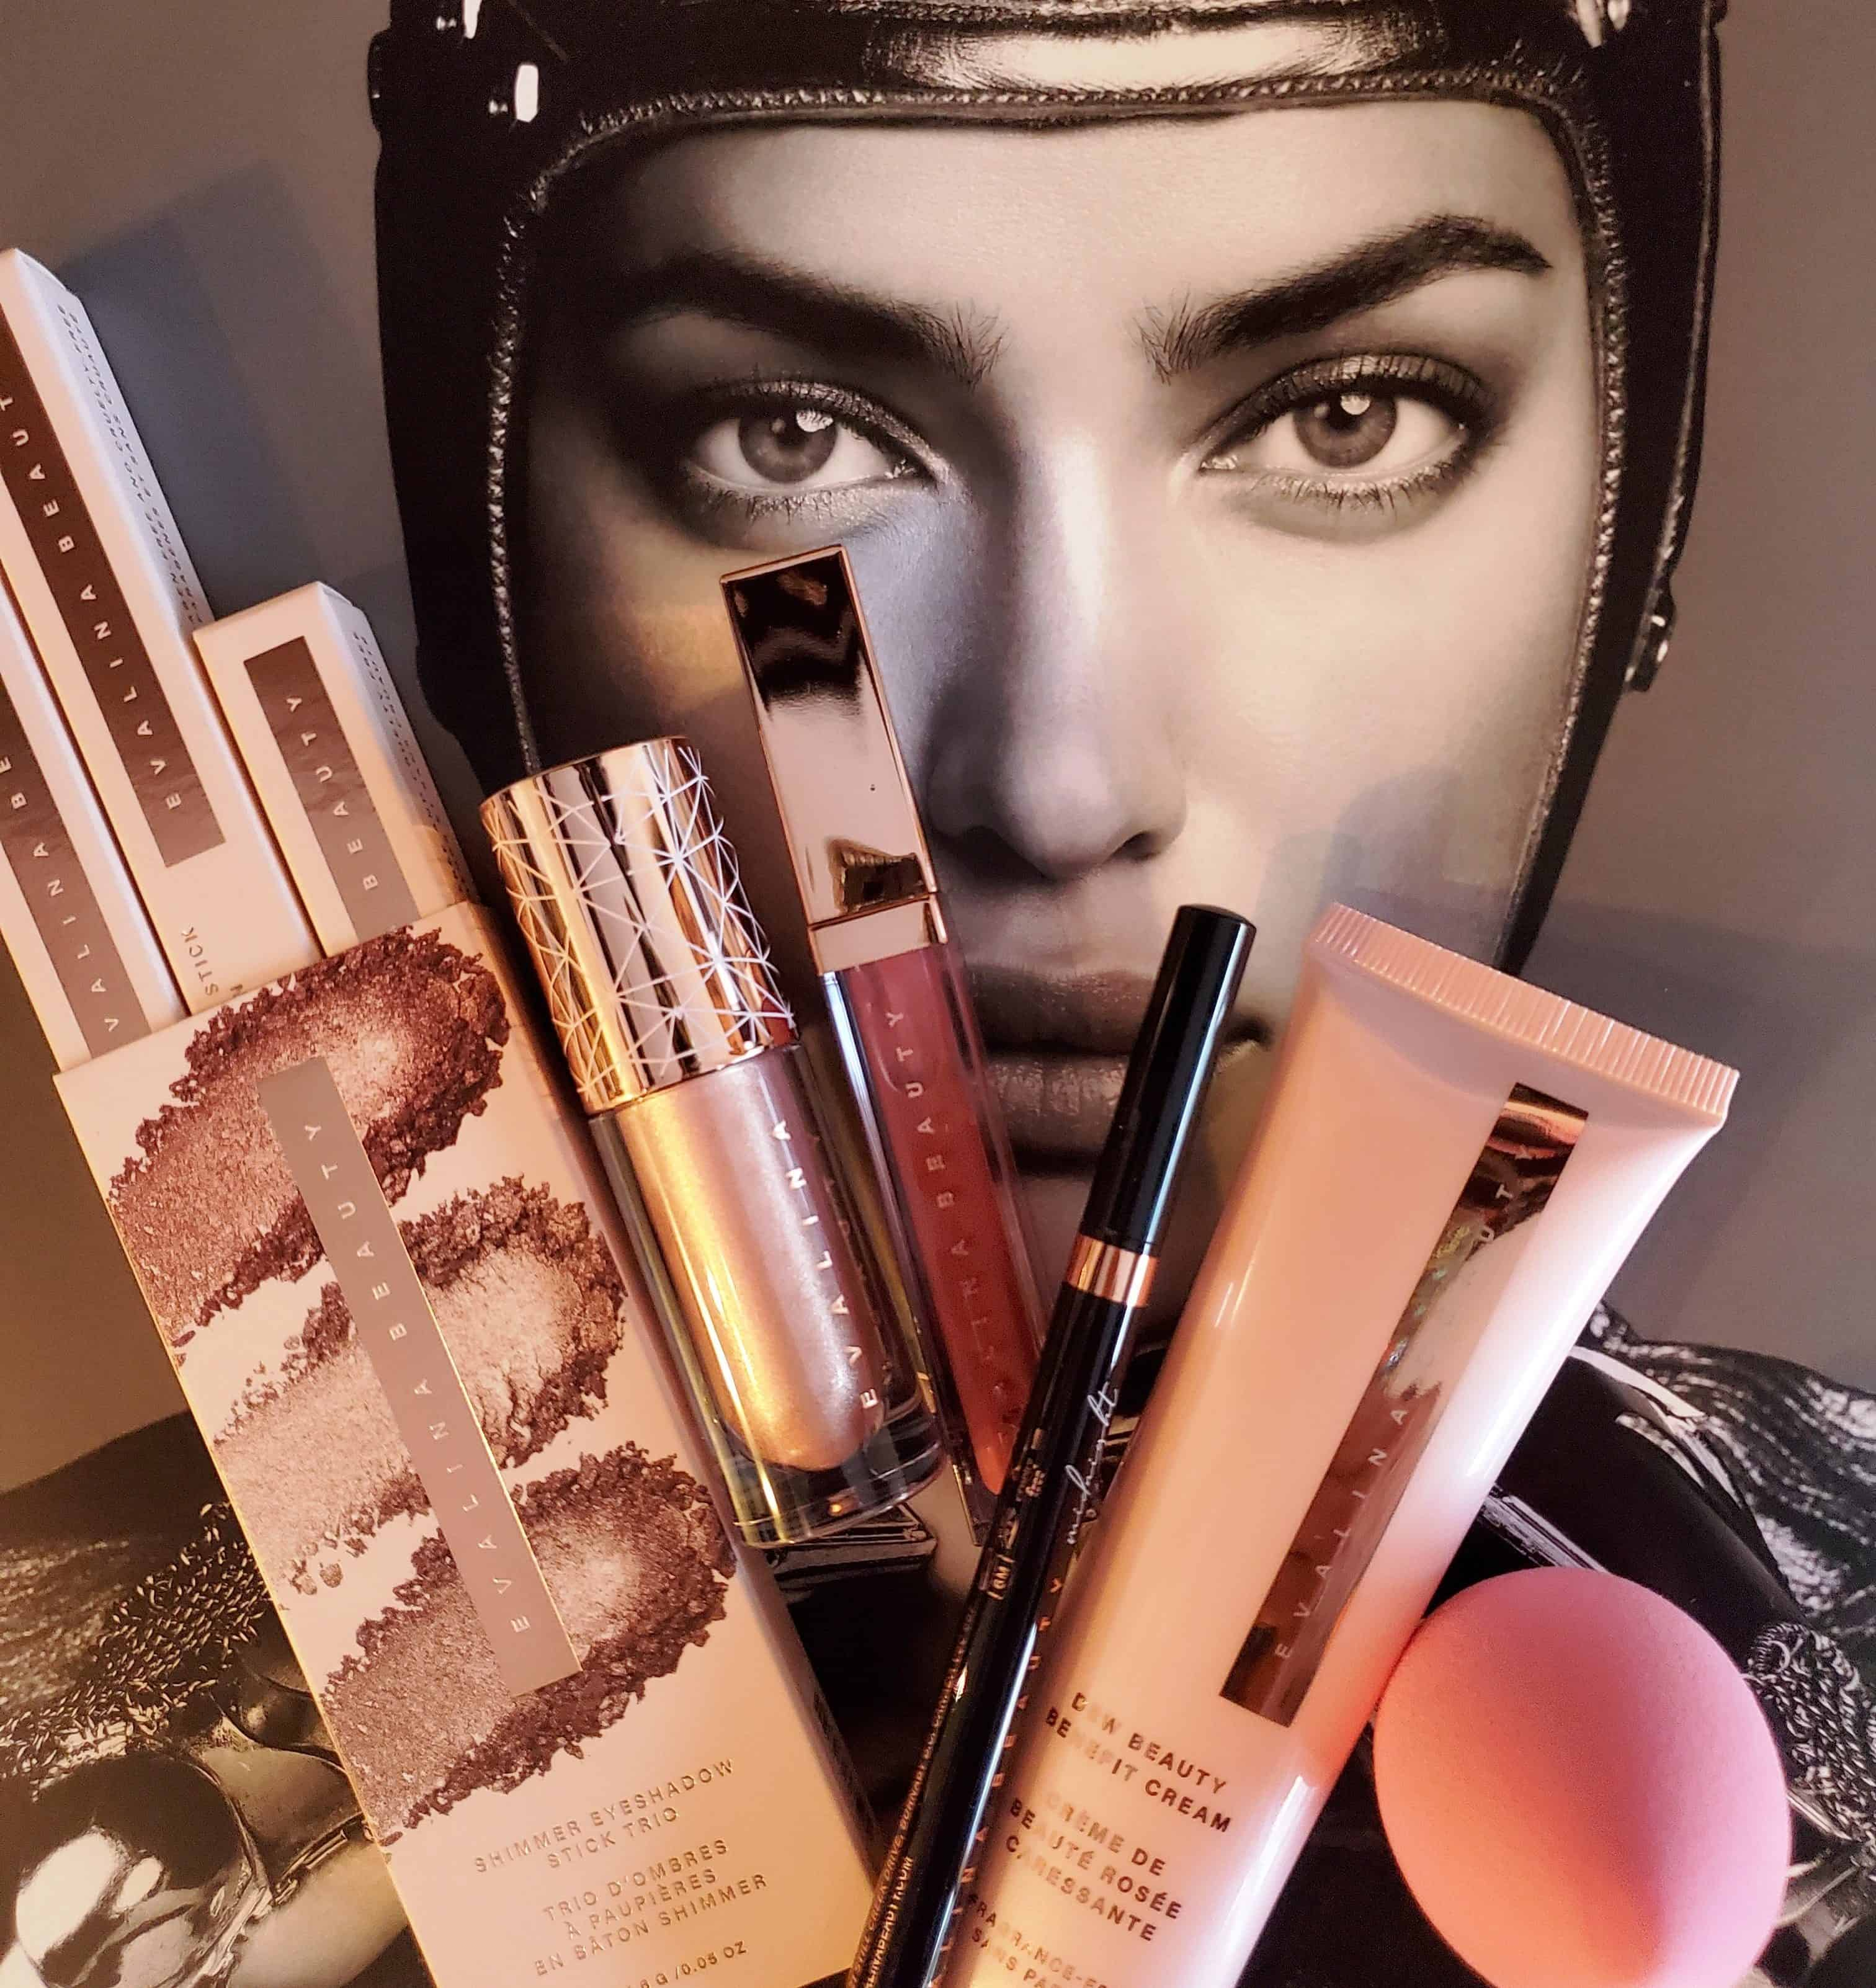 EcoLux☆Lifestyle: Evalina Beauty Launches Feel Good Cosmetics